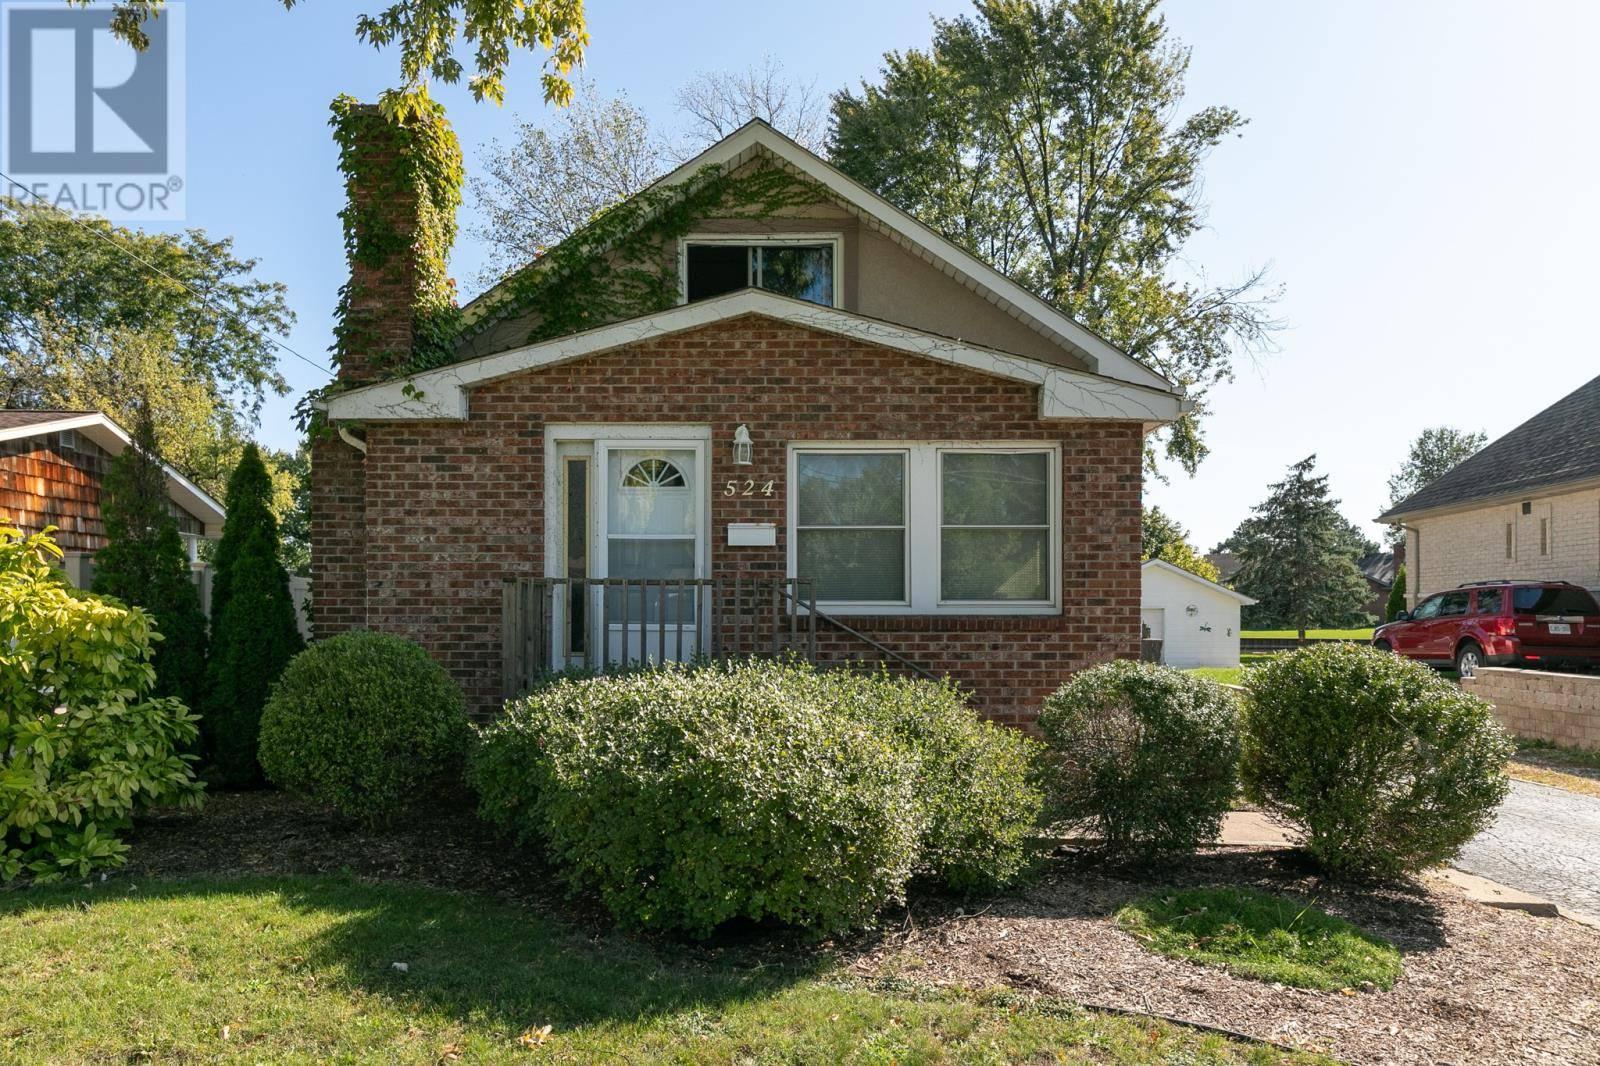 House for sale at 524 Brighton  Tecumseh Ontario - MLS: 19027474